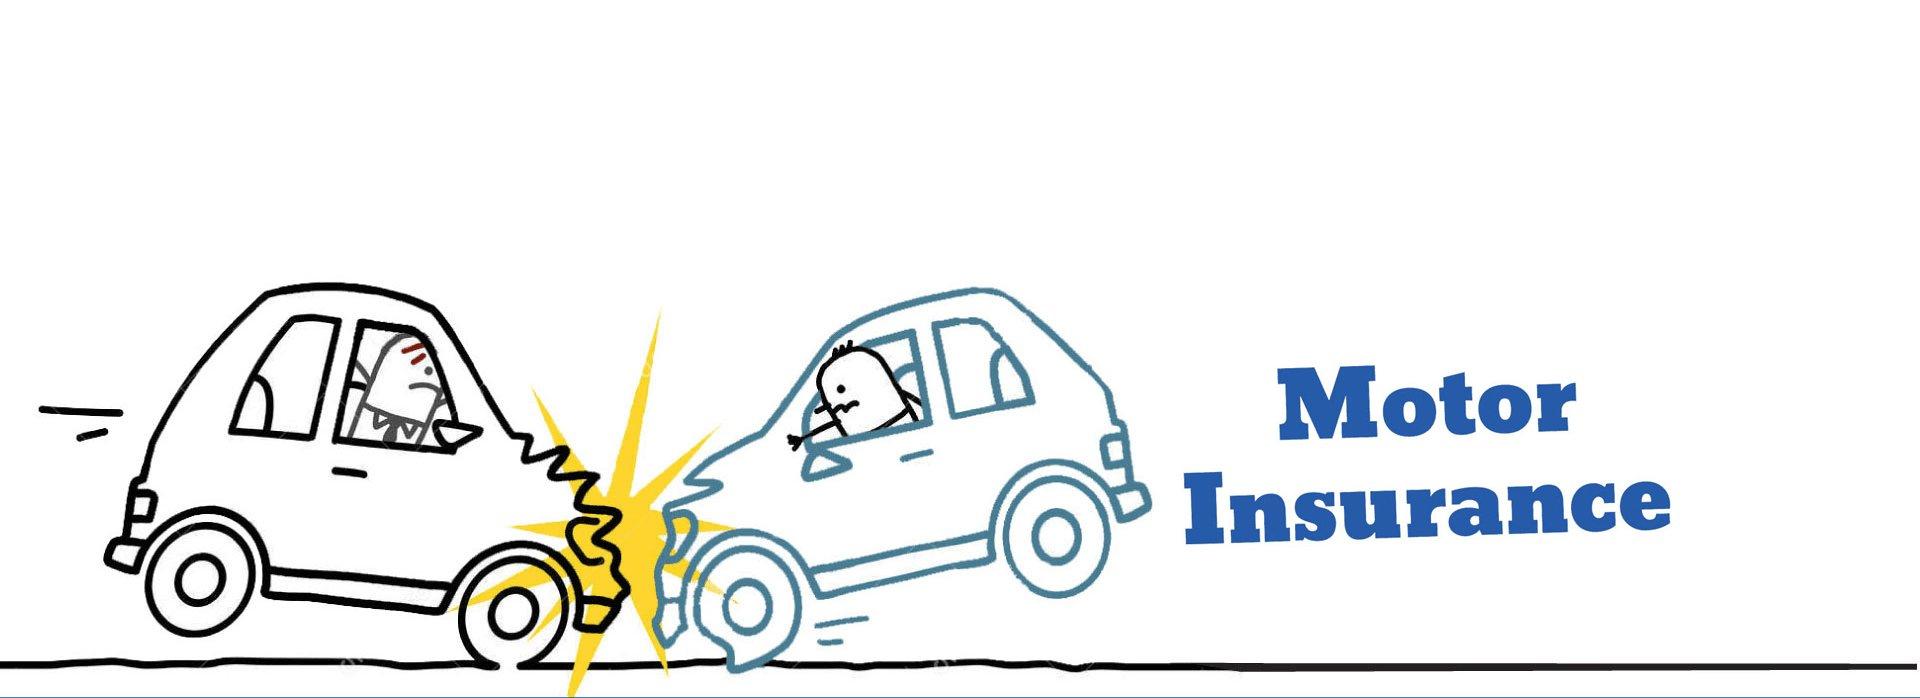 Motor insurance graphic